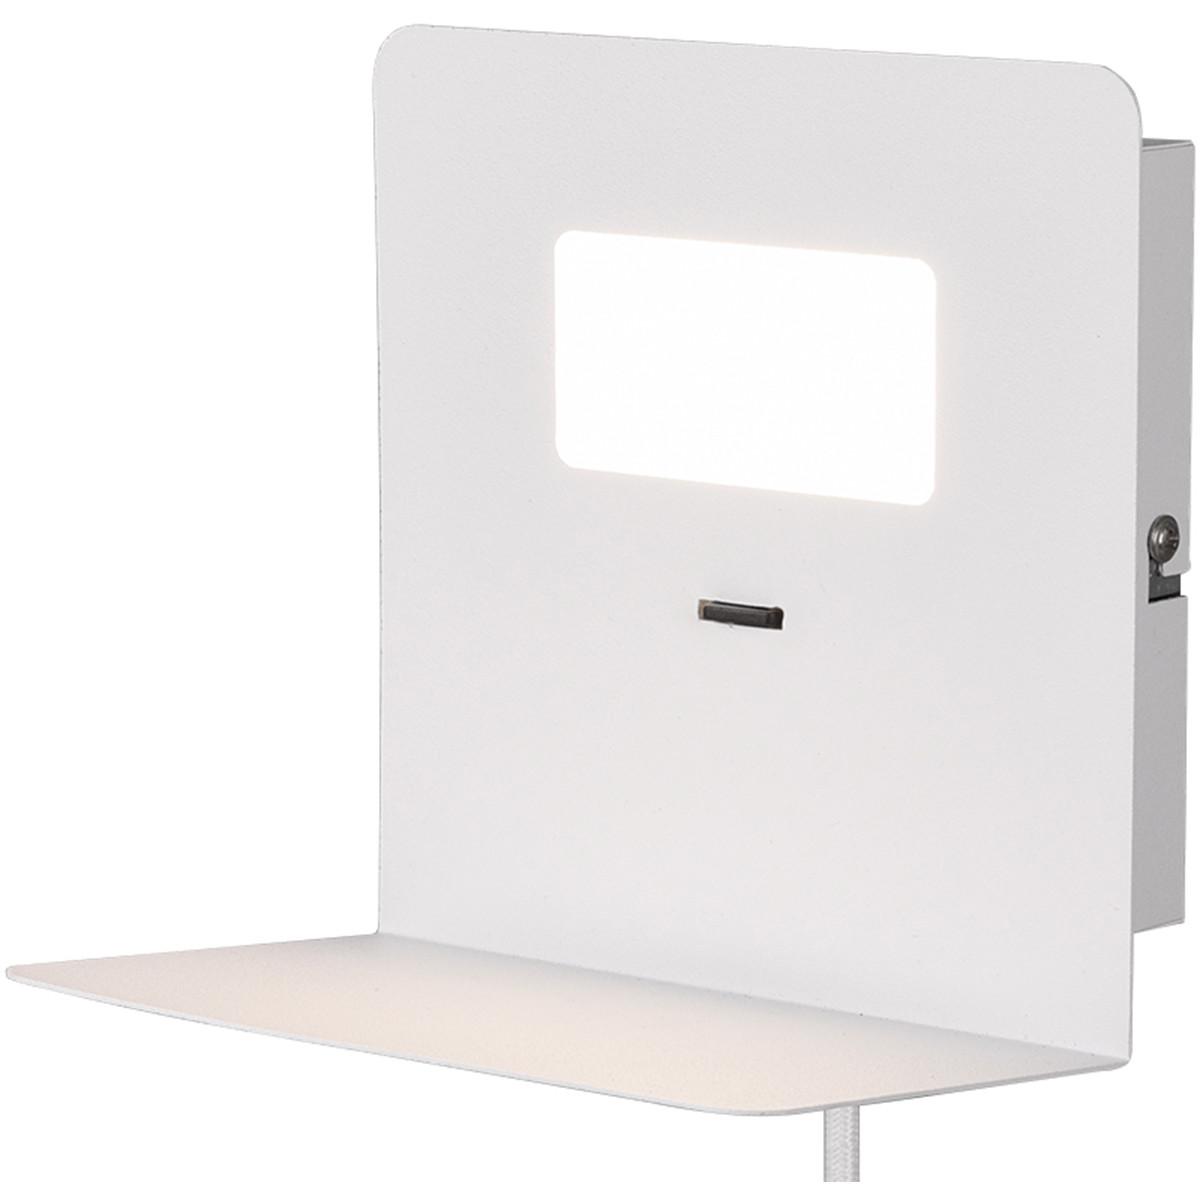 LED Wandlamp - Trion Alinoft - 3W - Warm Wit 3000K - USB Oplaadfunctie - Mat Wit - Aluminium